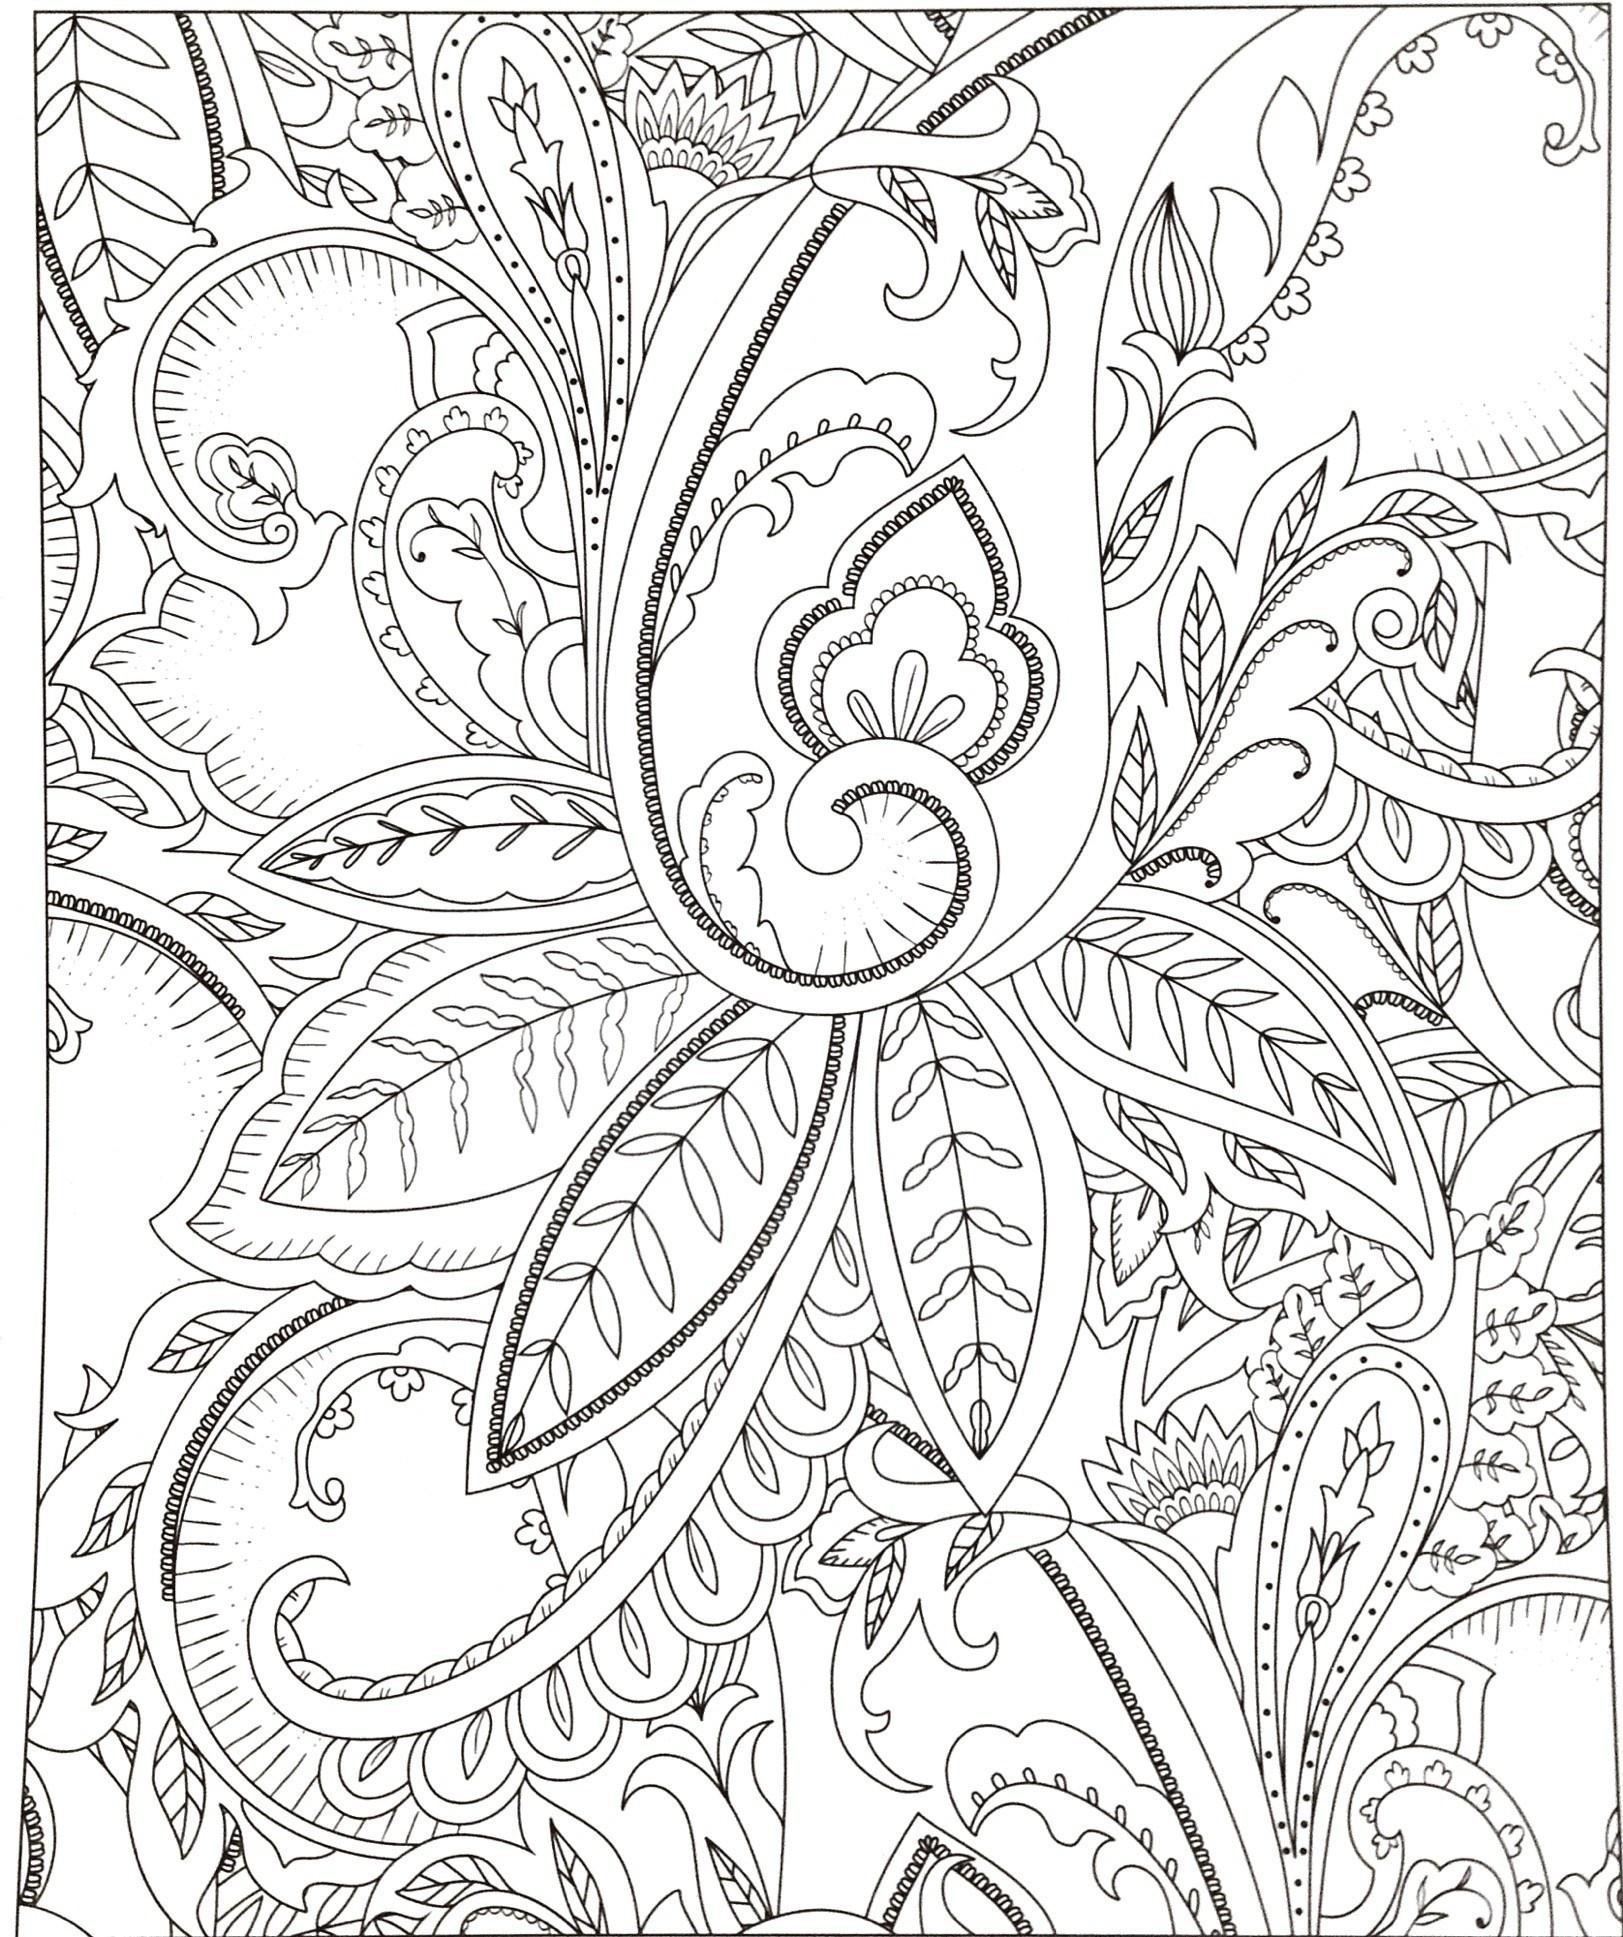 flower vase large size of flower image big size pets nature wallpaper in flower image printable inspiring cool vases flower vase coloring page pages flowers in a top i